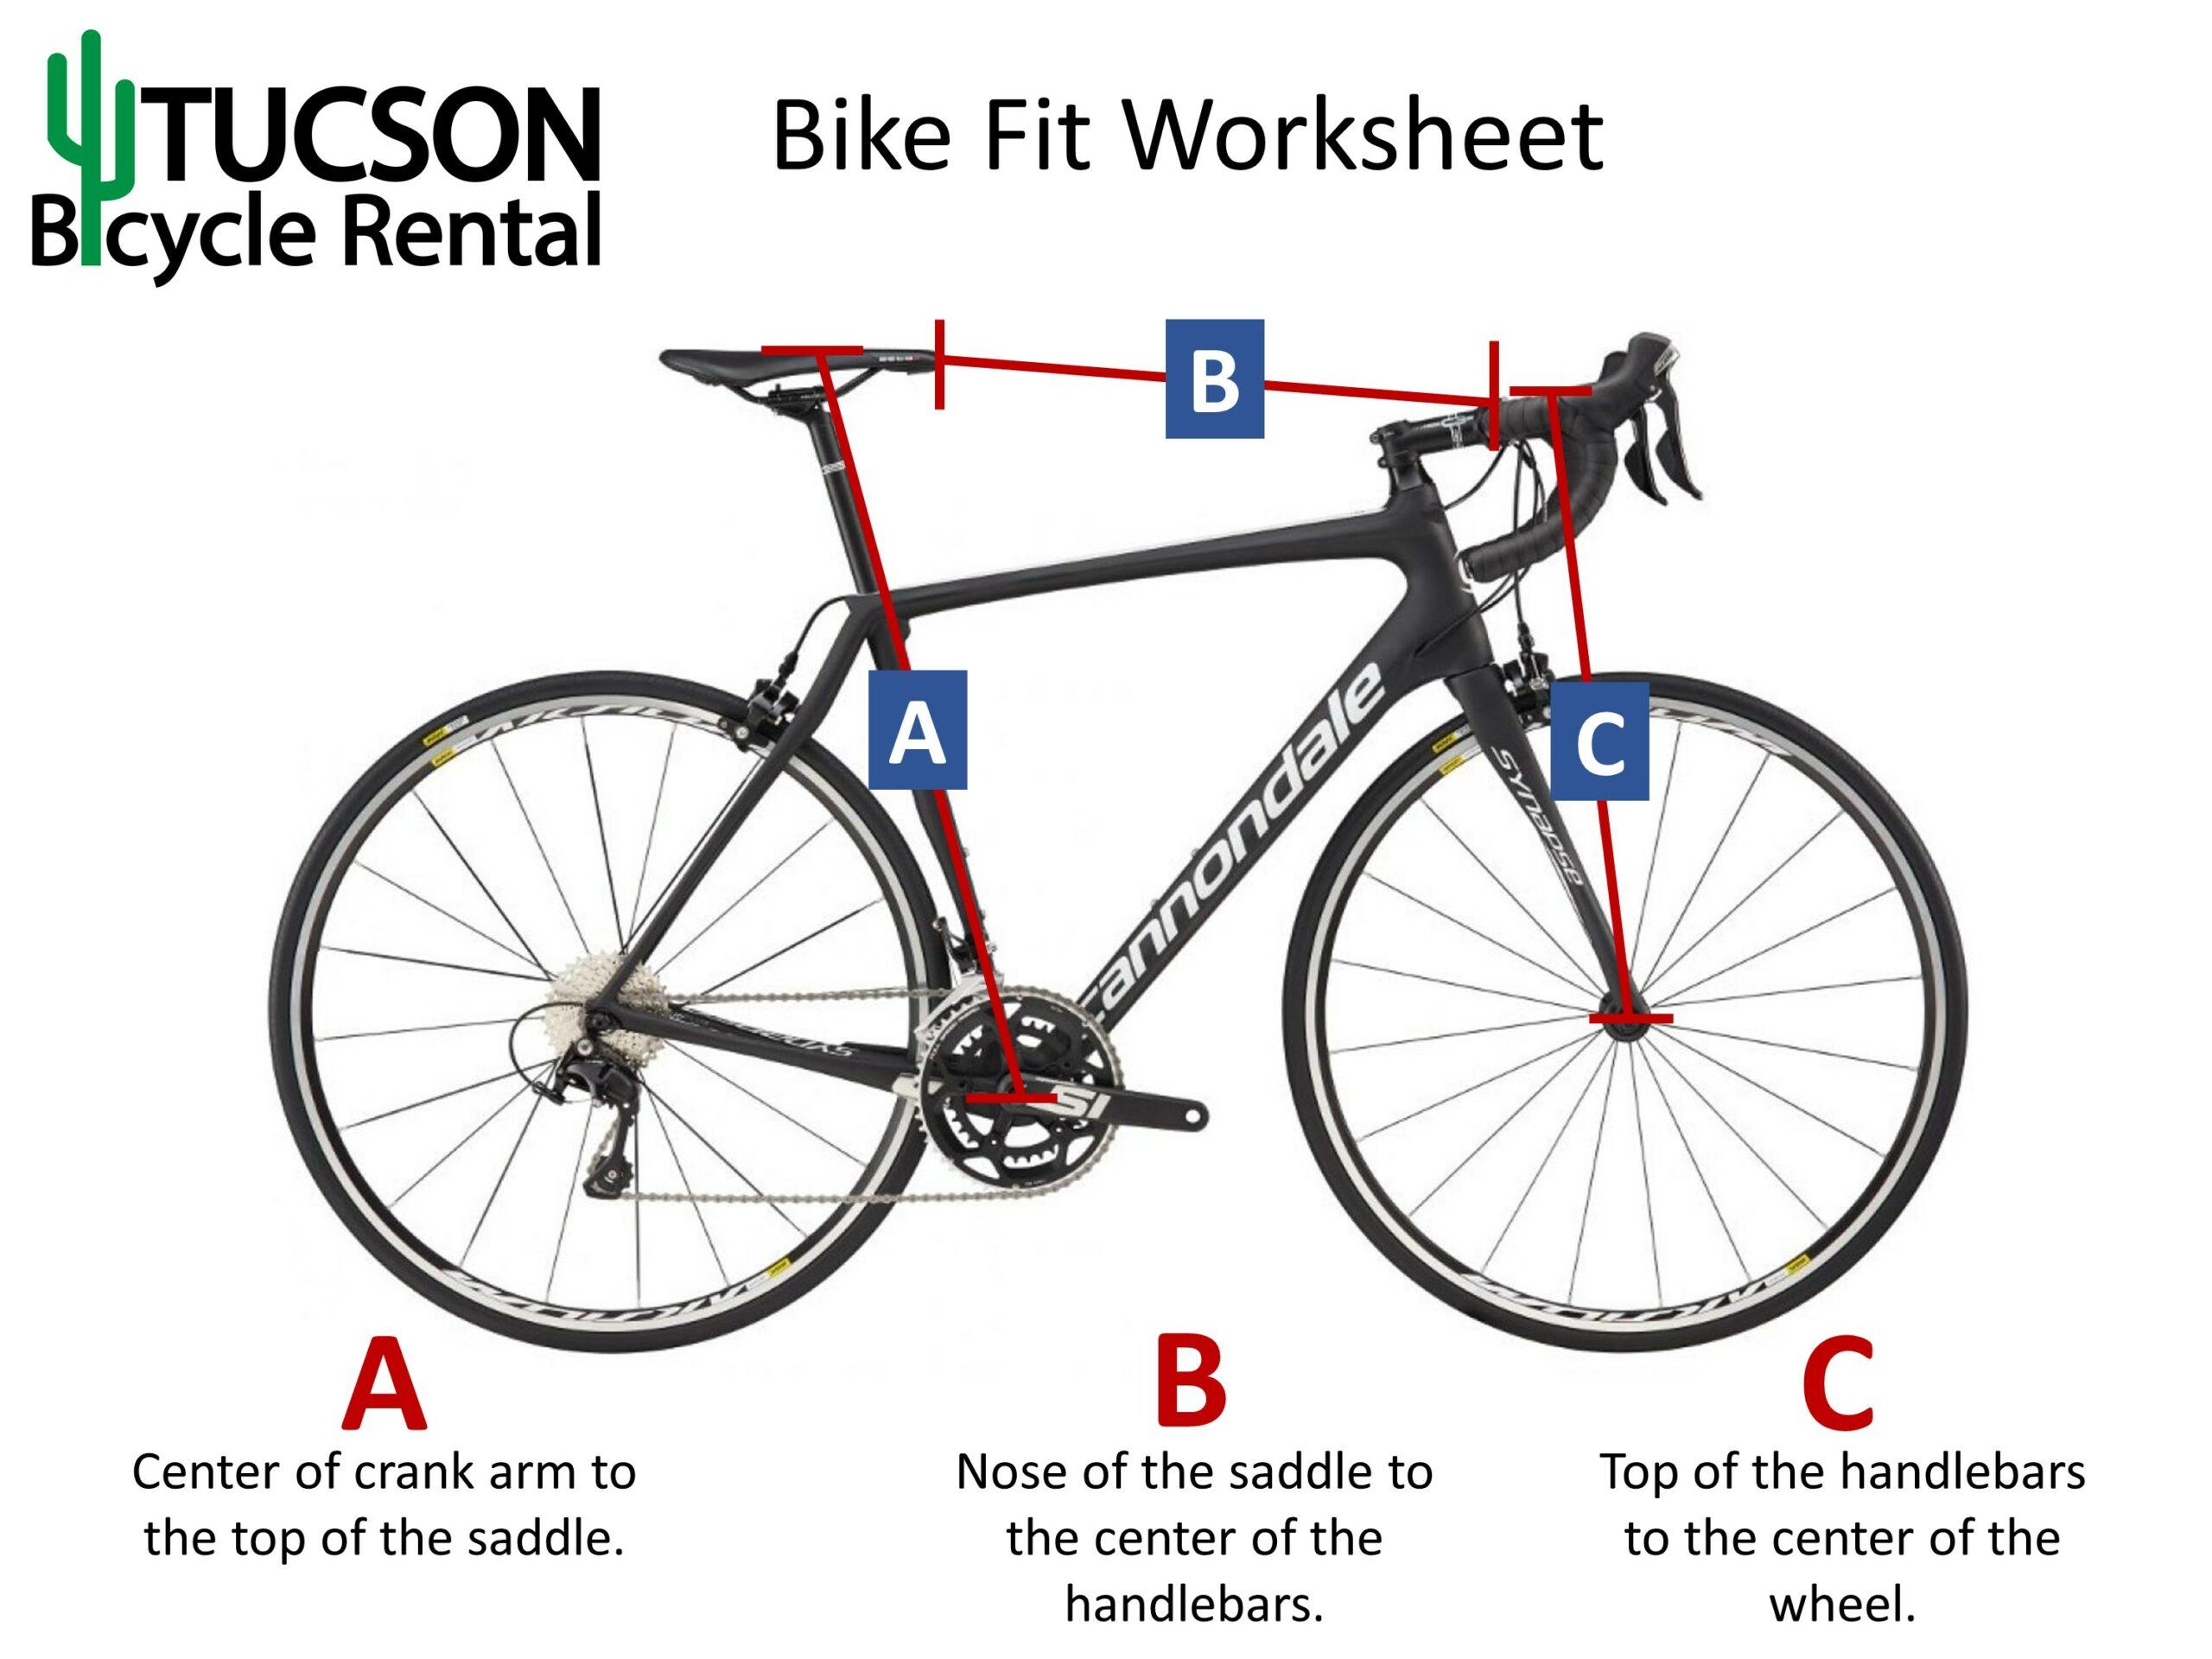 Tucson Bicyle Rental Bike Fit Worksheet